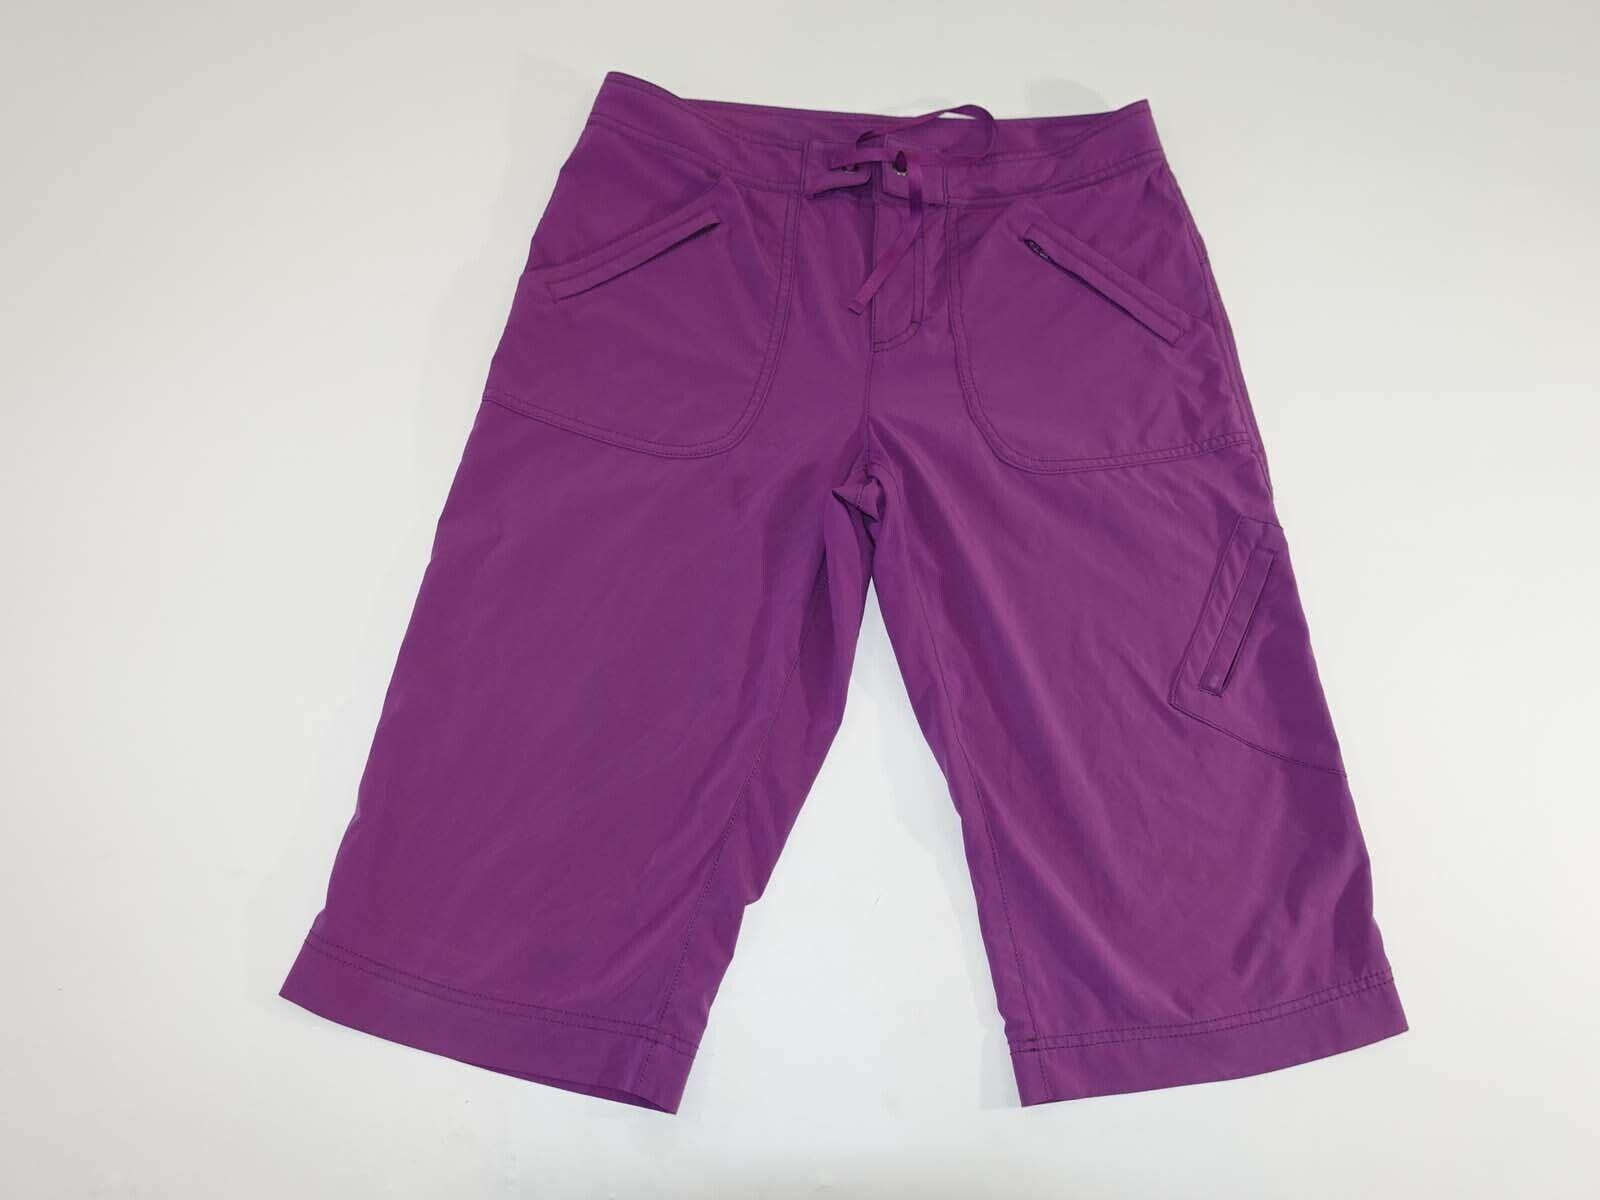 Athleta Damen Wandern Cargo Capri Sporthose Größe 8 Lila Flach Vorne